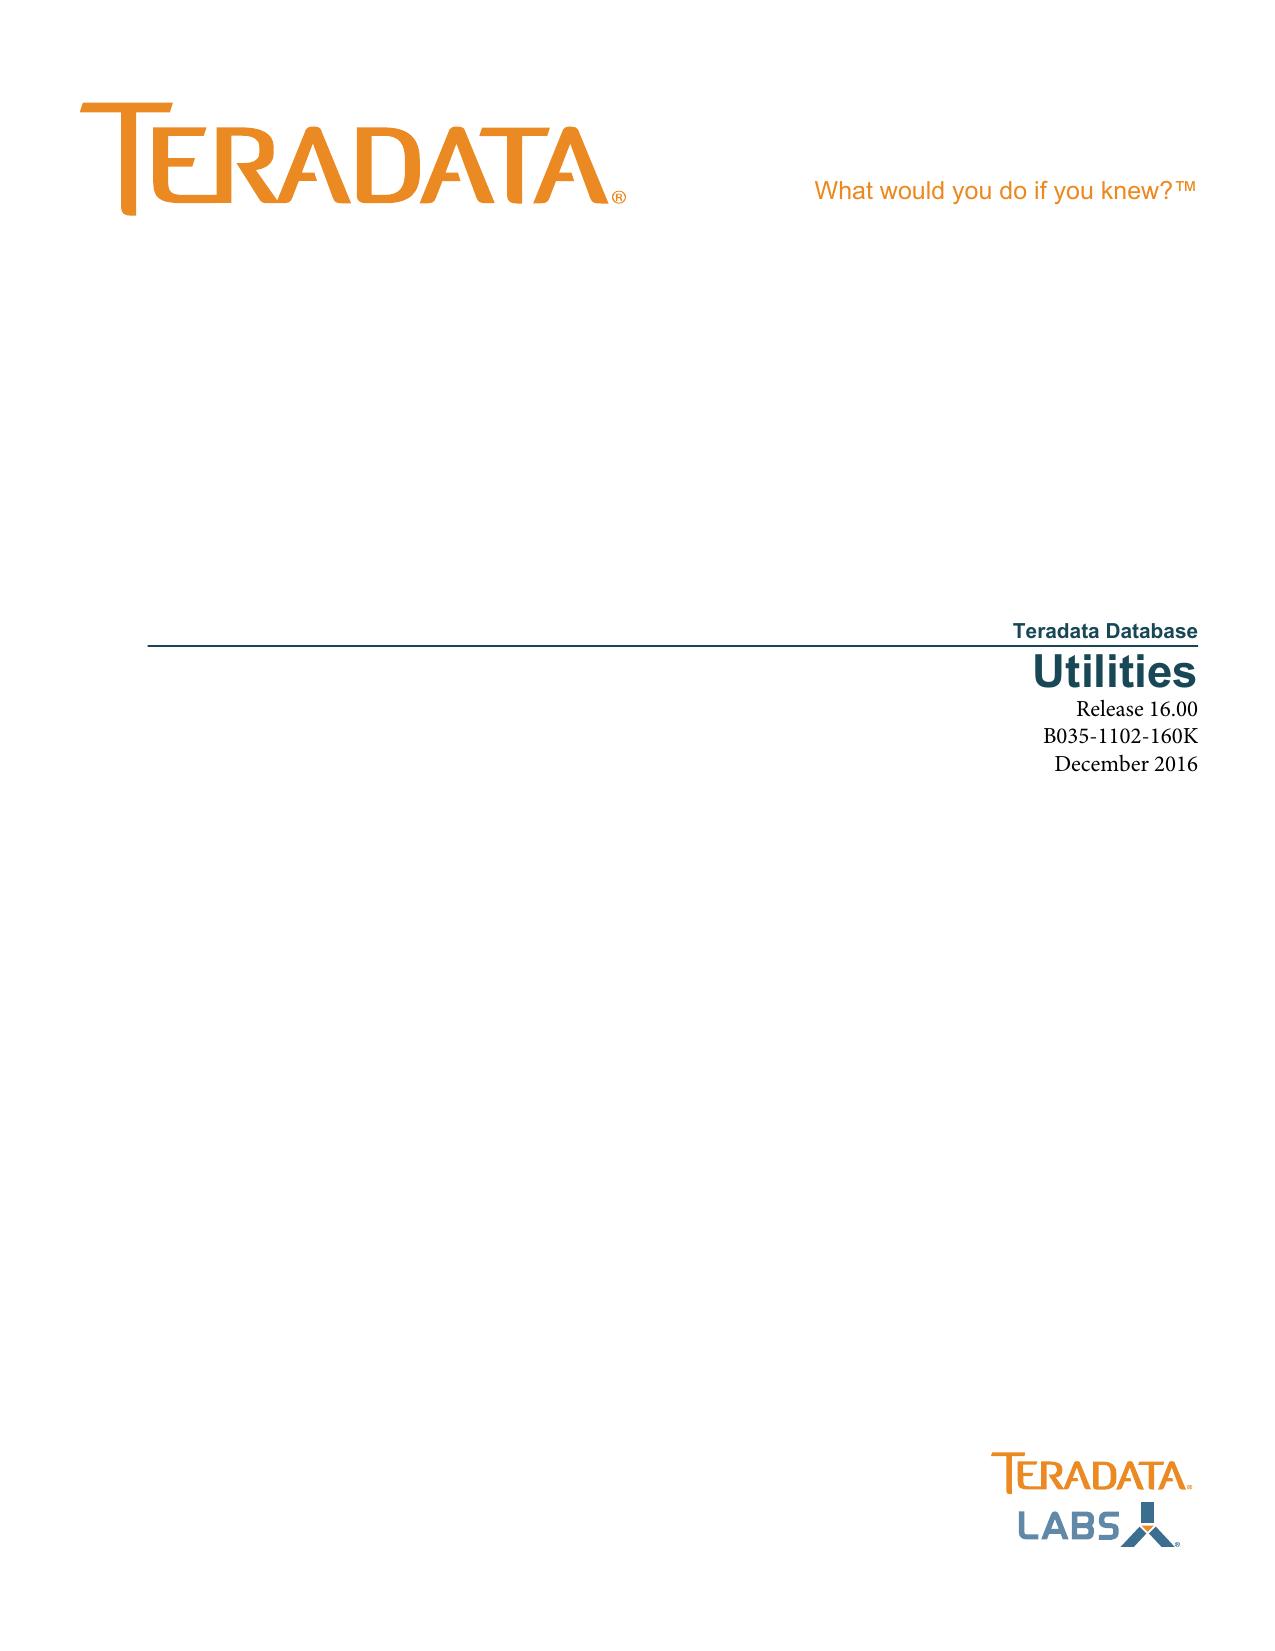 utilities teradata documentation manualzz com rh manualzz com User Manual Reference Manual Clip Art